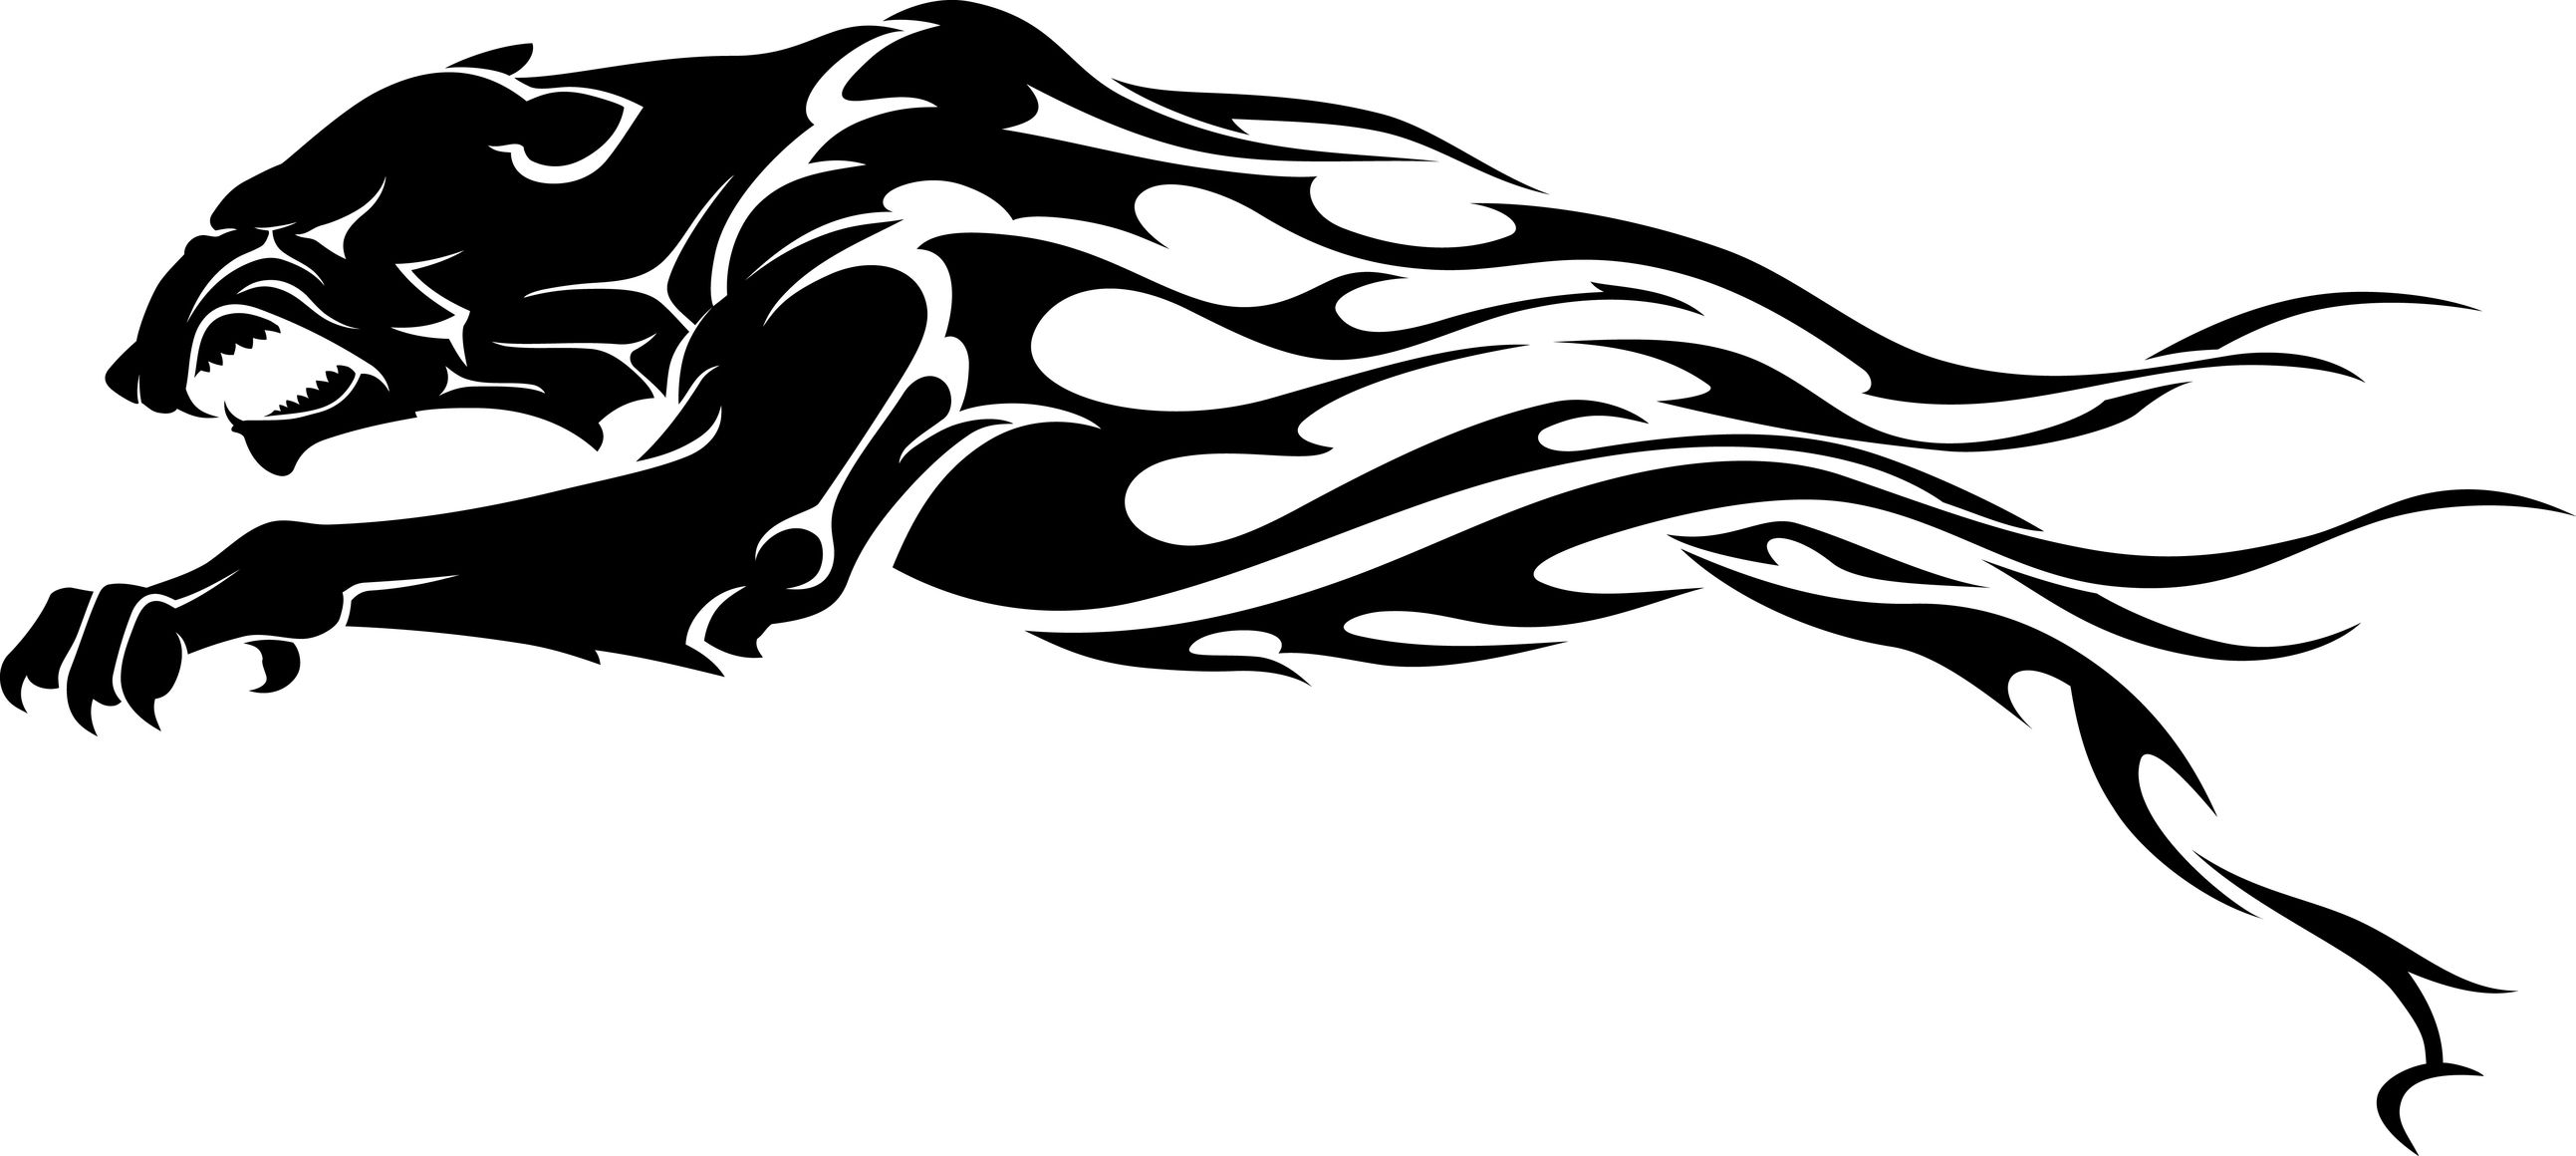 Tribal Black Panther Tattoo